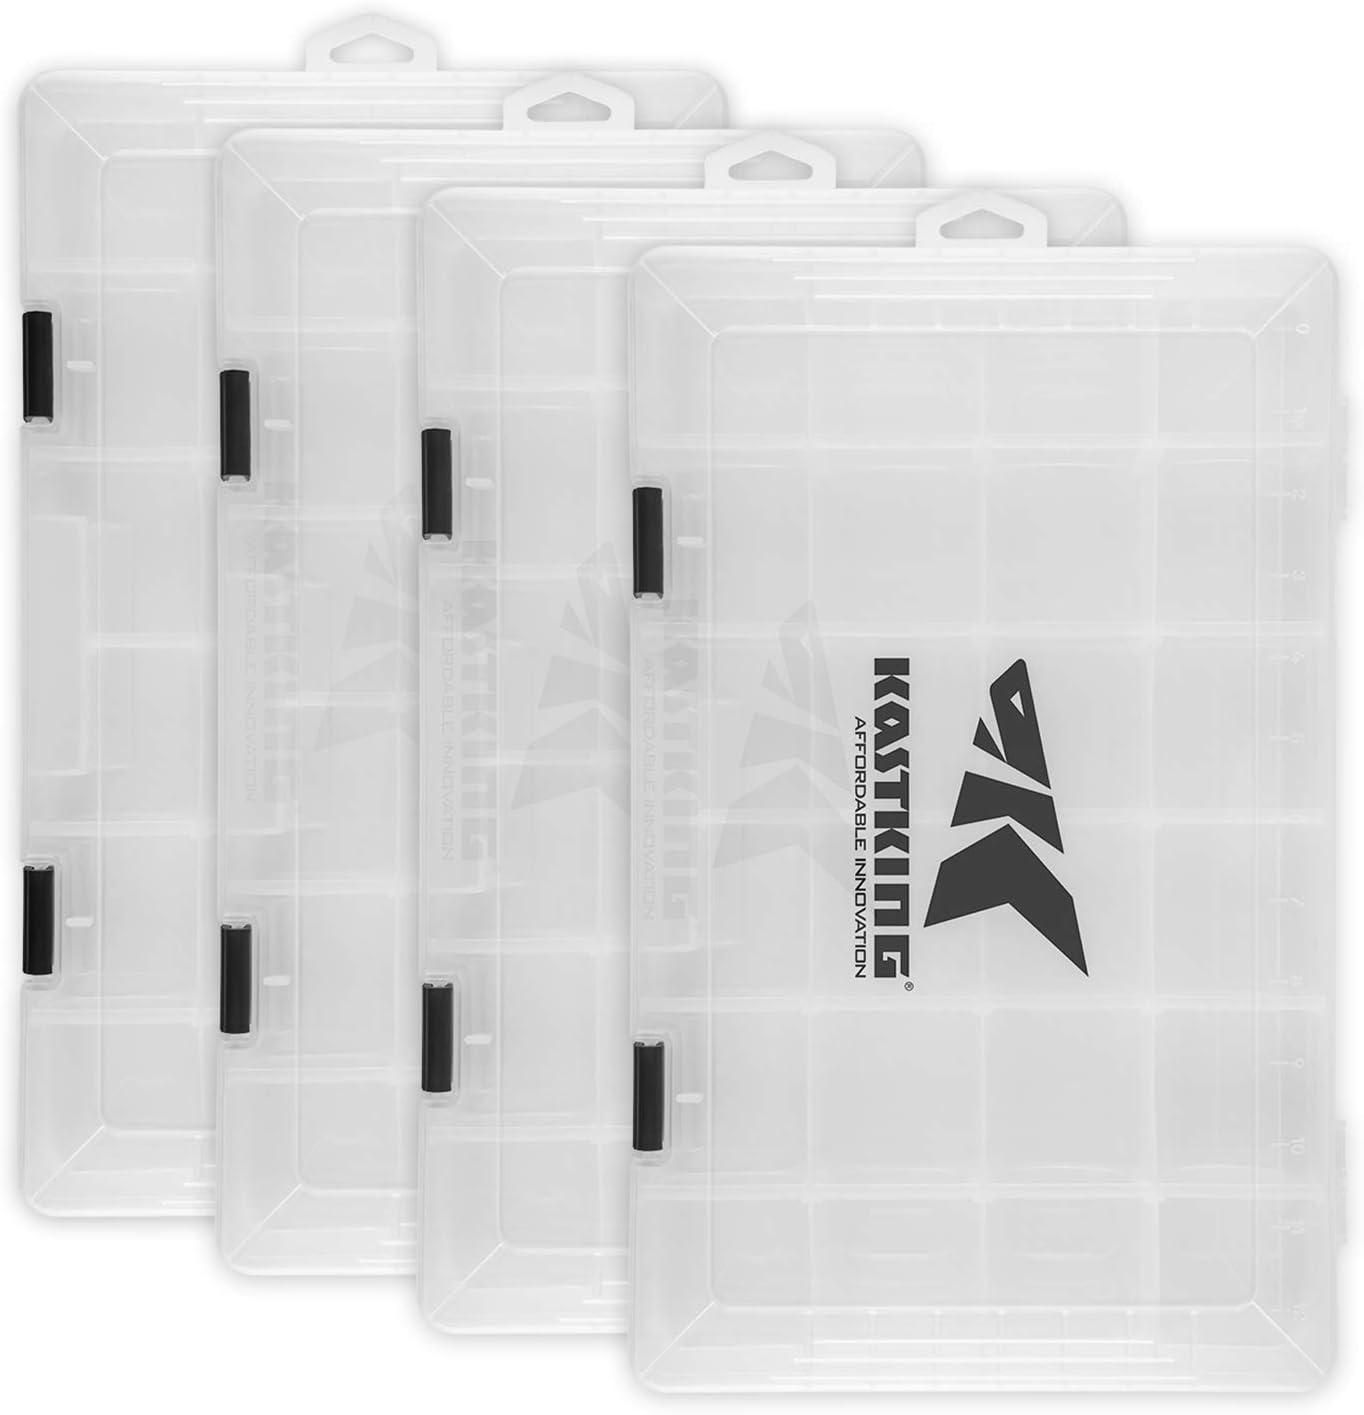 KastKing Tackle Boxes Miami Mall Ranking TOP4 Plastic Storage Bo Organizer Box